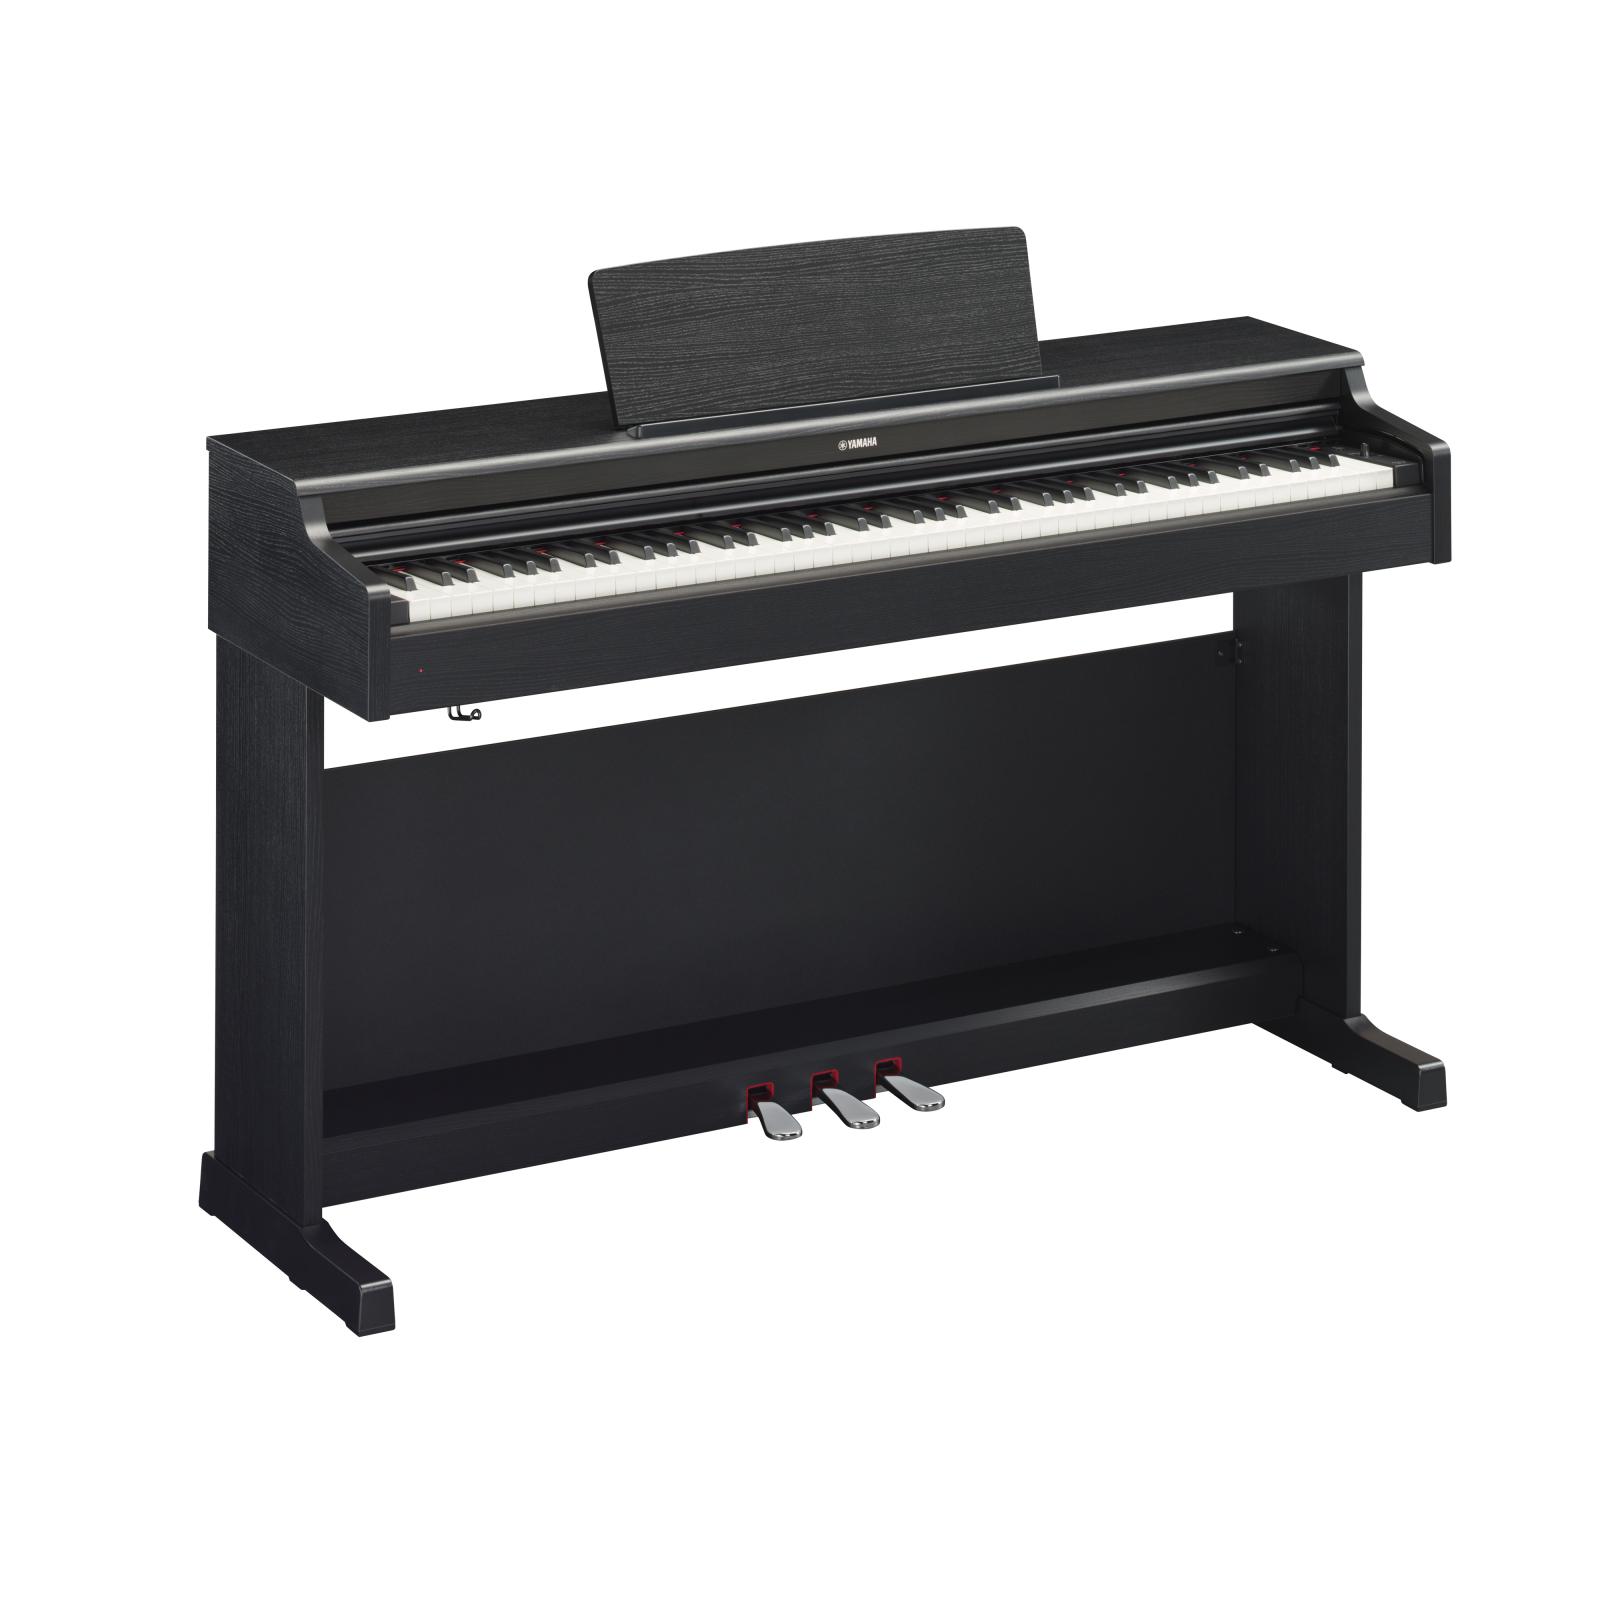 Yamaha YDP164B Arius Traditional Console Digital Piano - Black Walnut